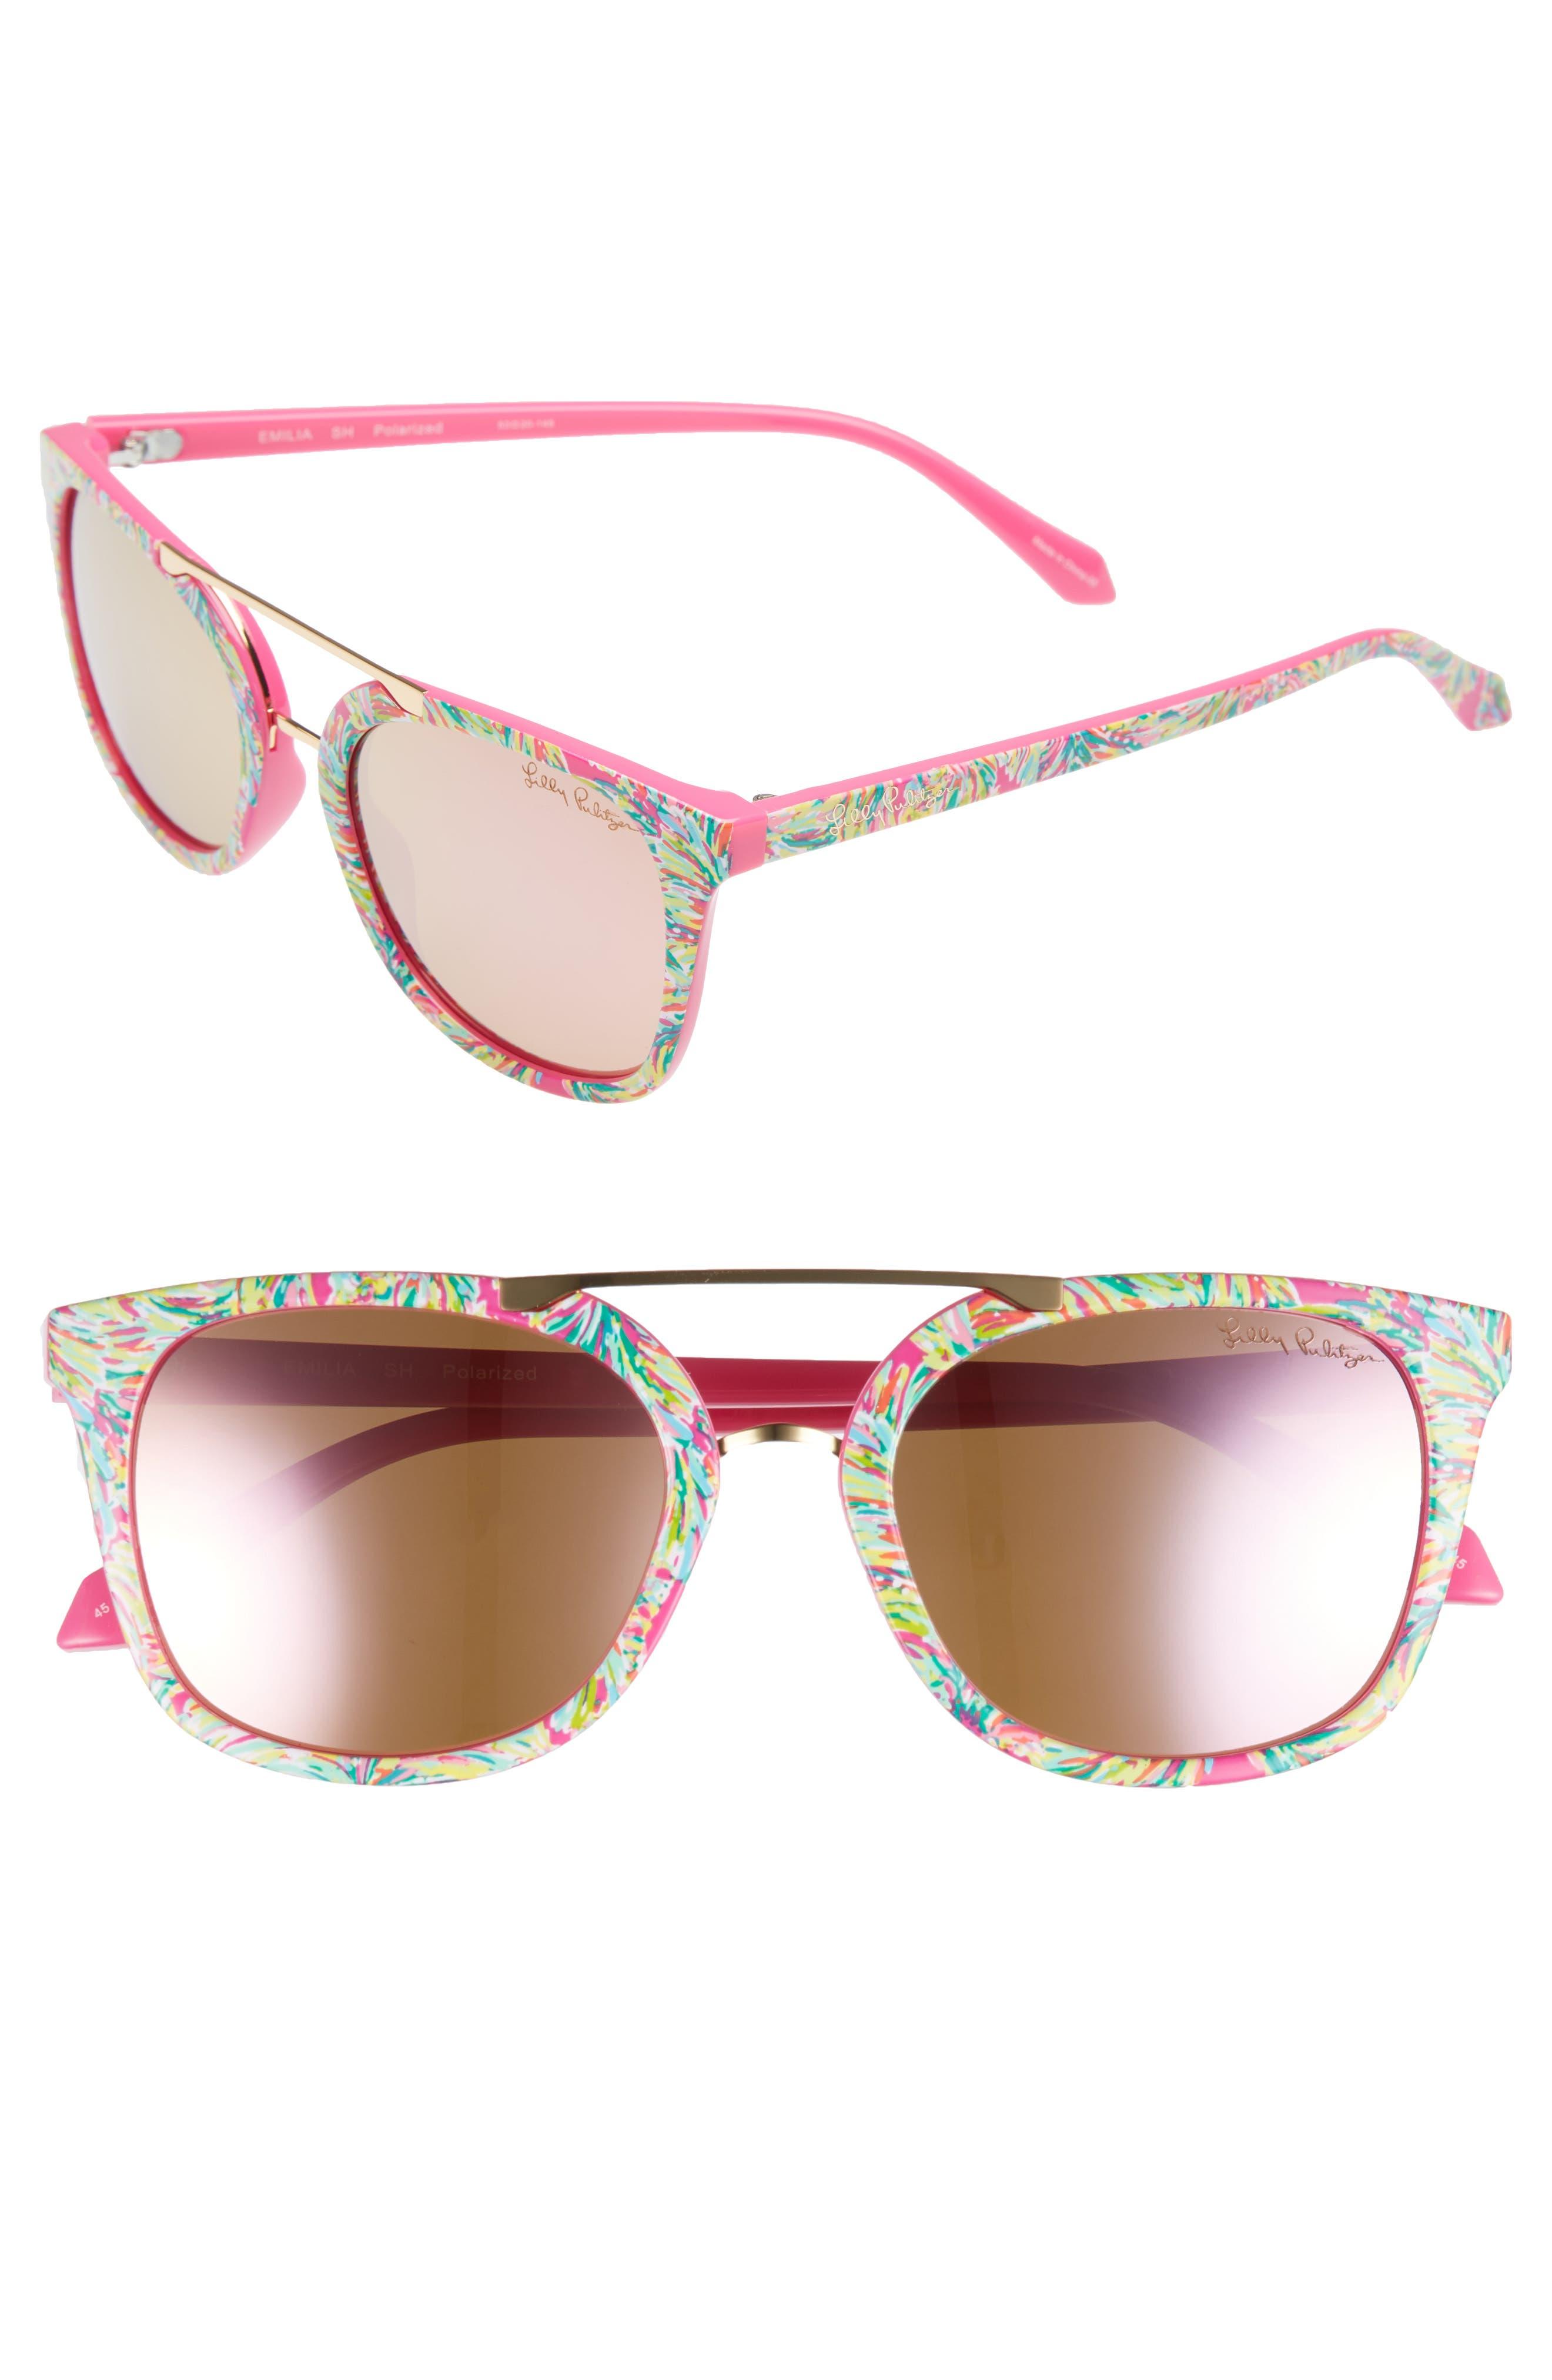 Women's Lilly Pulitzer Emilia 53mm Polarized Sunglasses